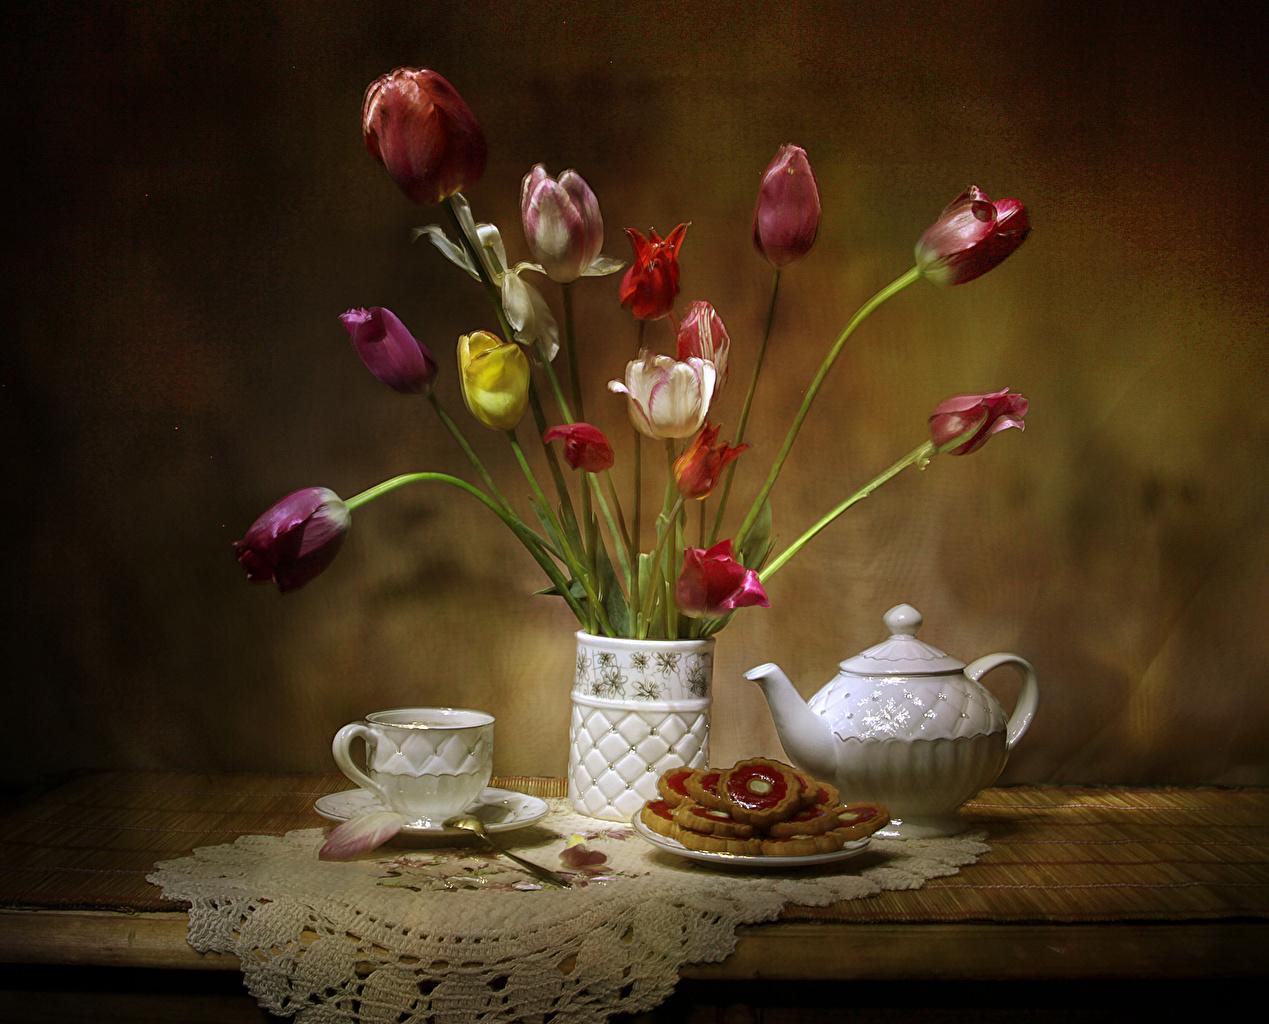 Фото тюльпан Цветы Чайник Ваза Пища Чашка Выпечка Натюрморт Тюльпаны цветок Еда вазе вазы чашке Продукты питания